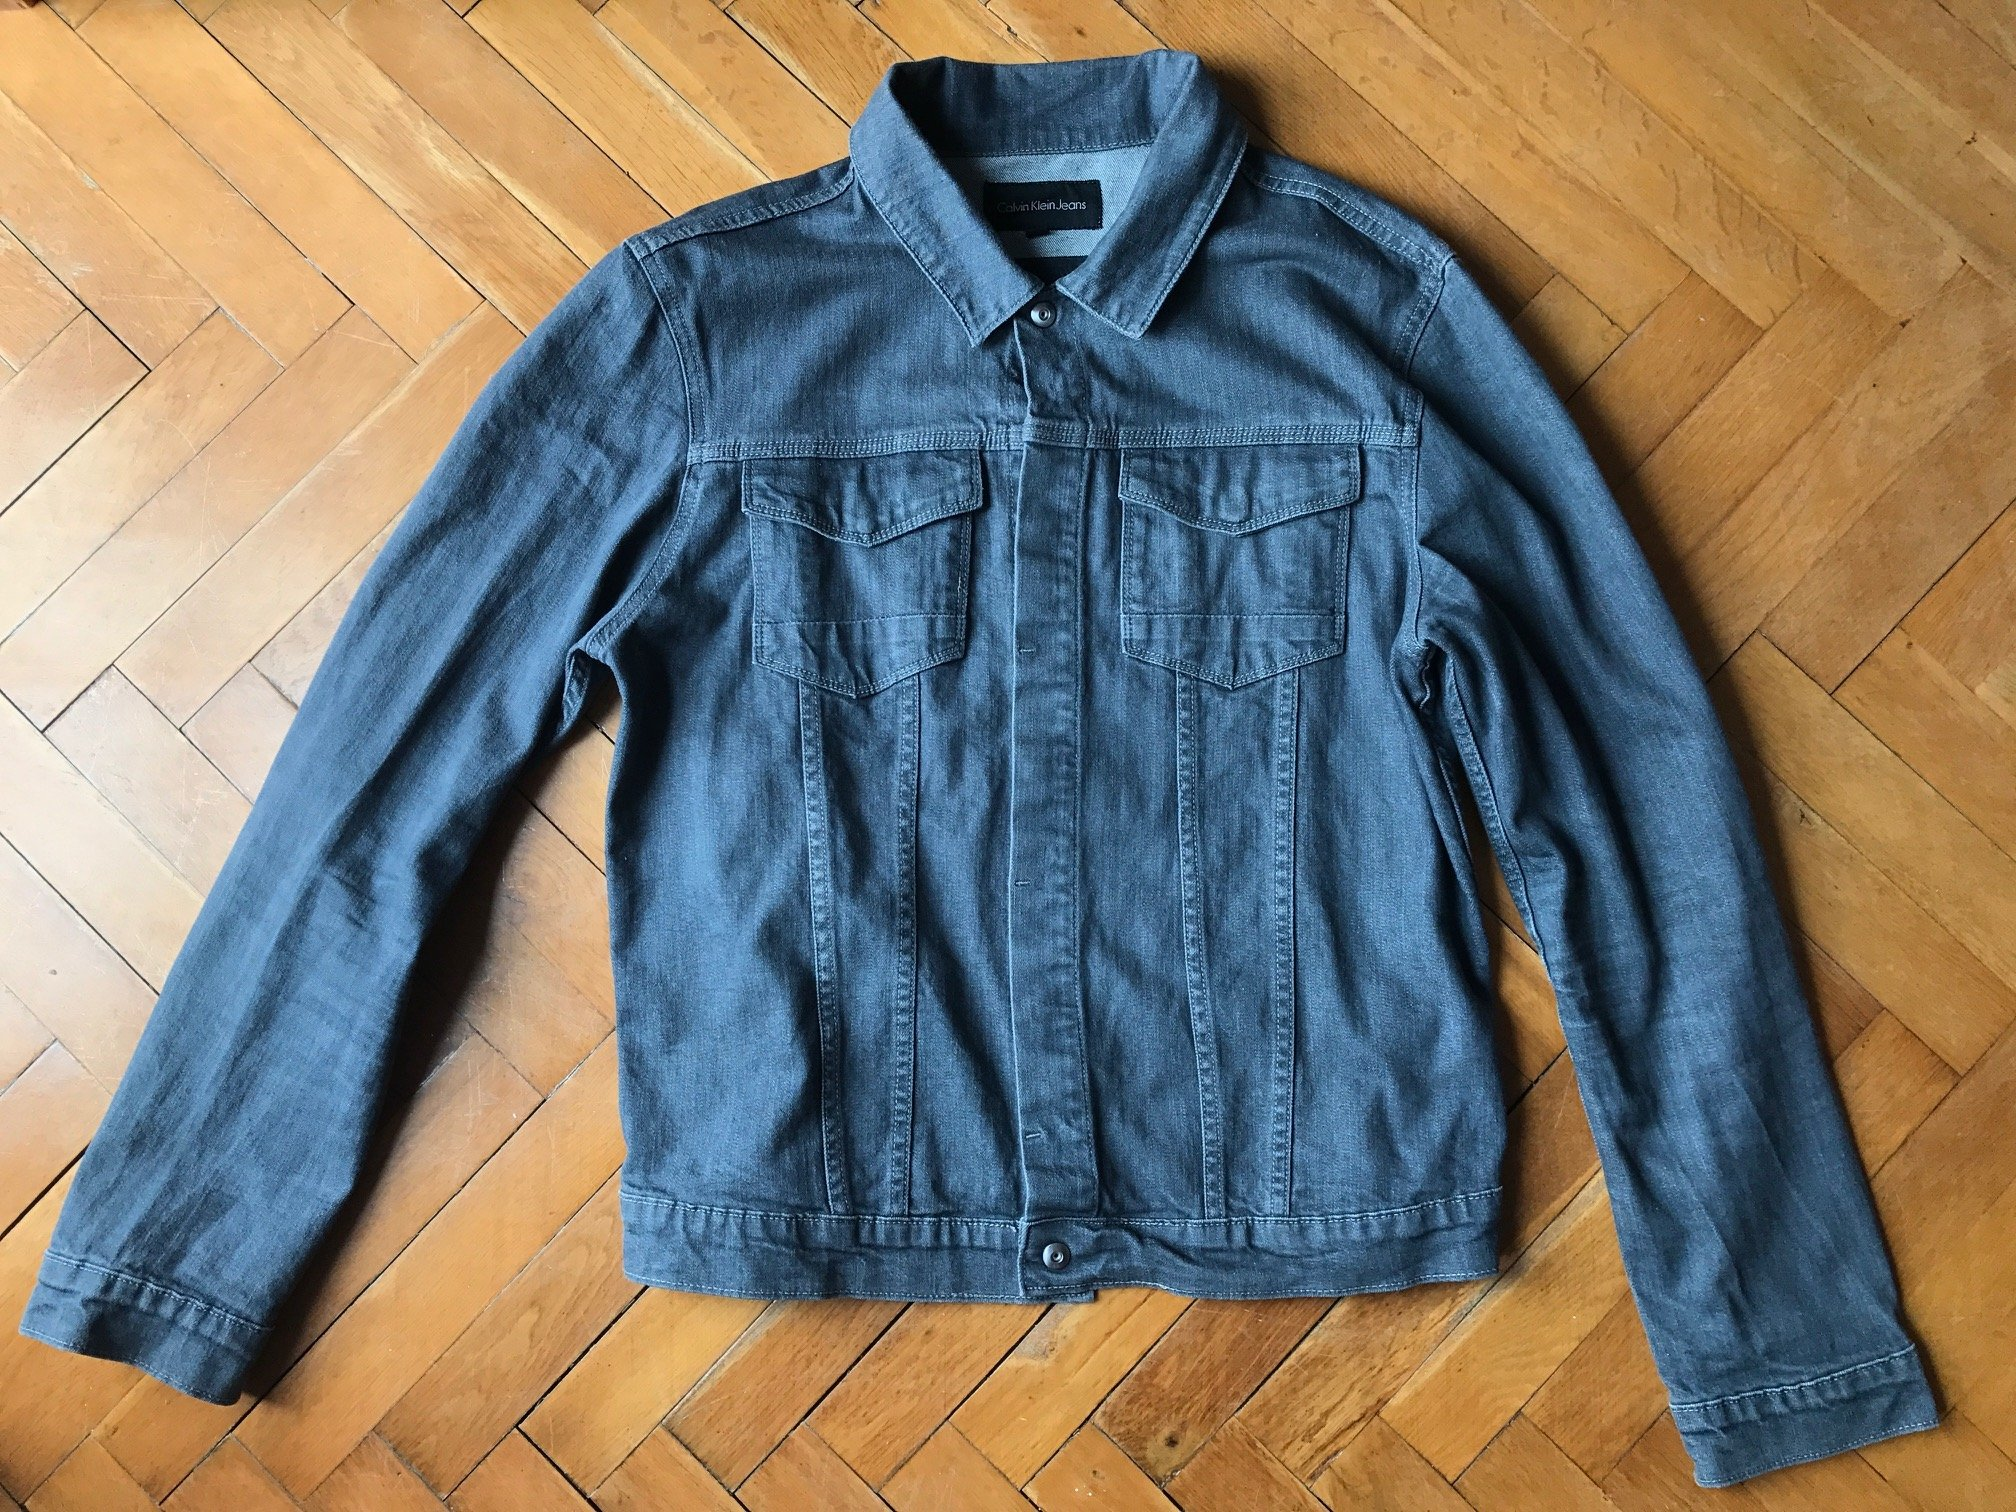 kurtka jeansowa meska calvina kleina z roku 2017